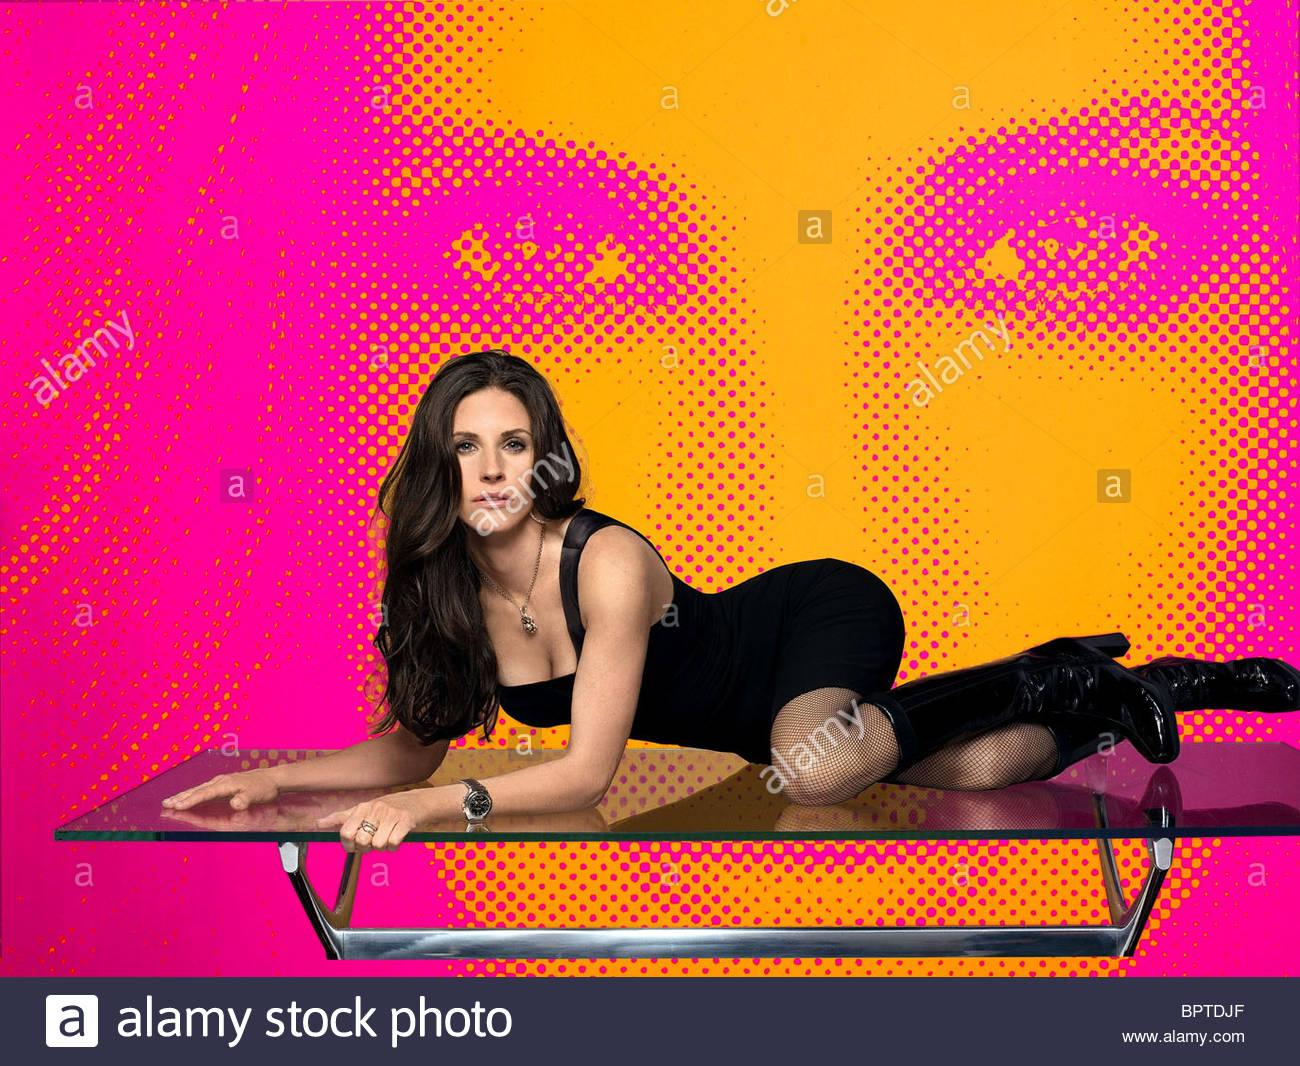 Pornographic Poster